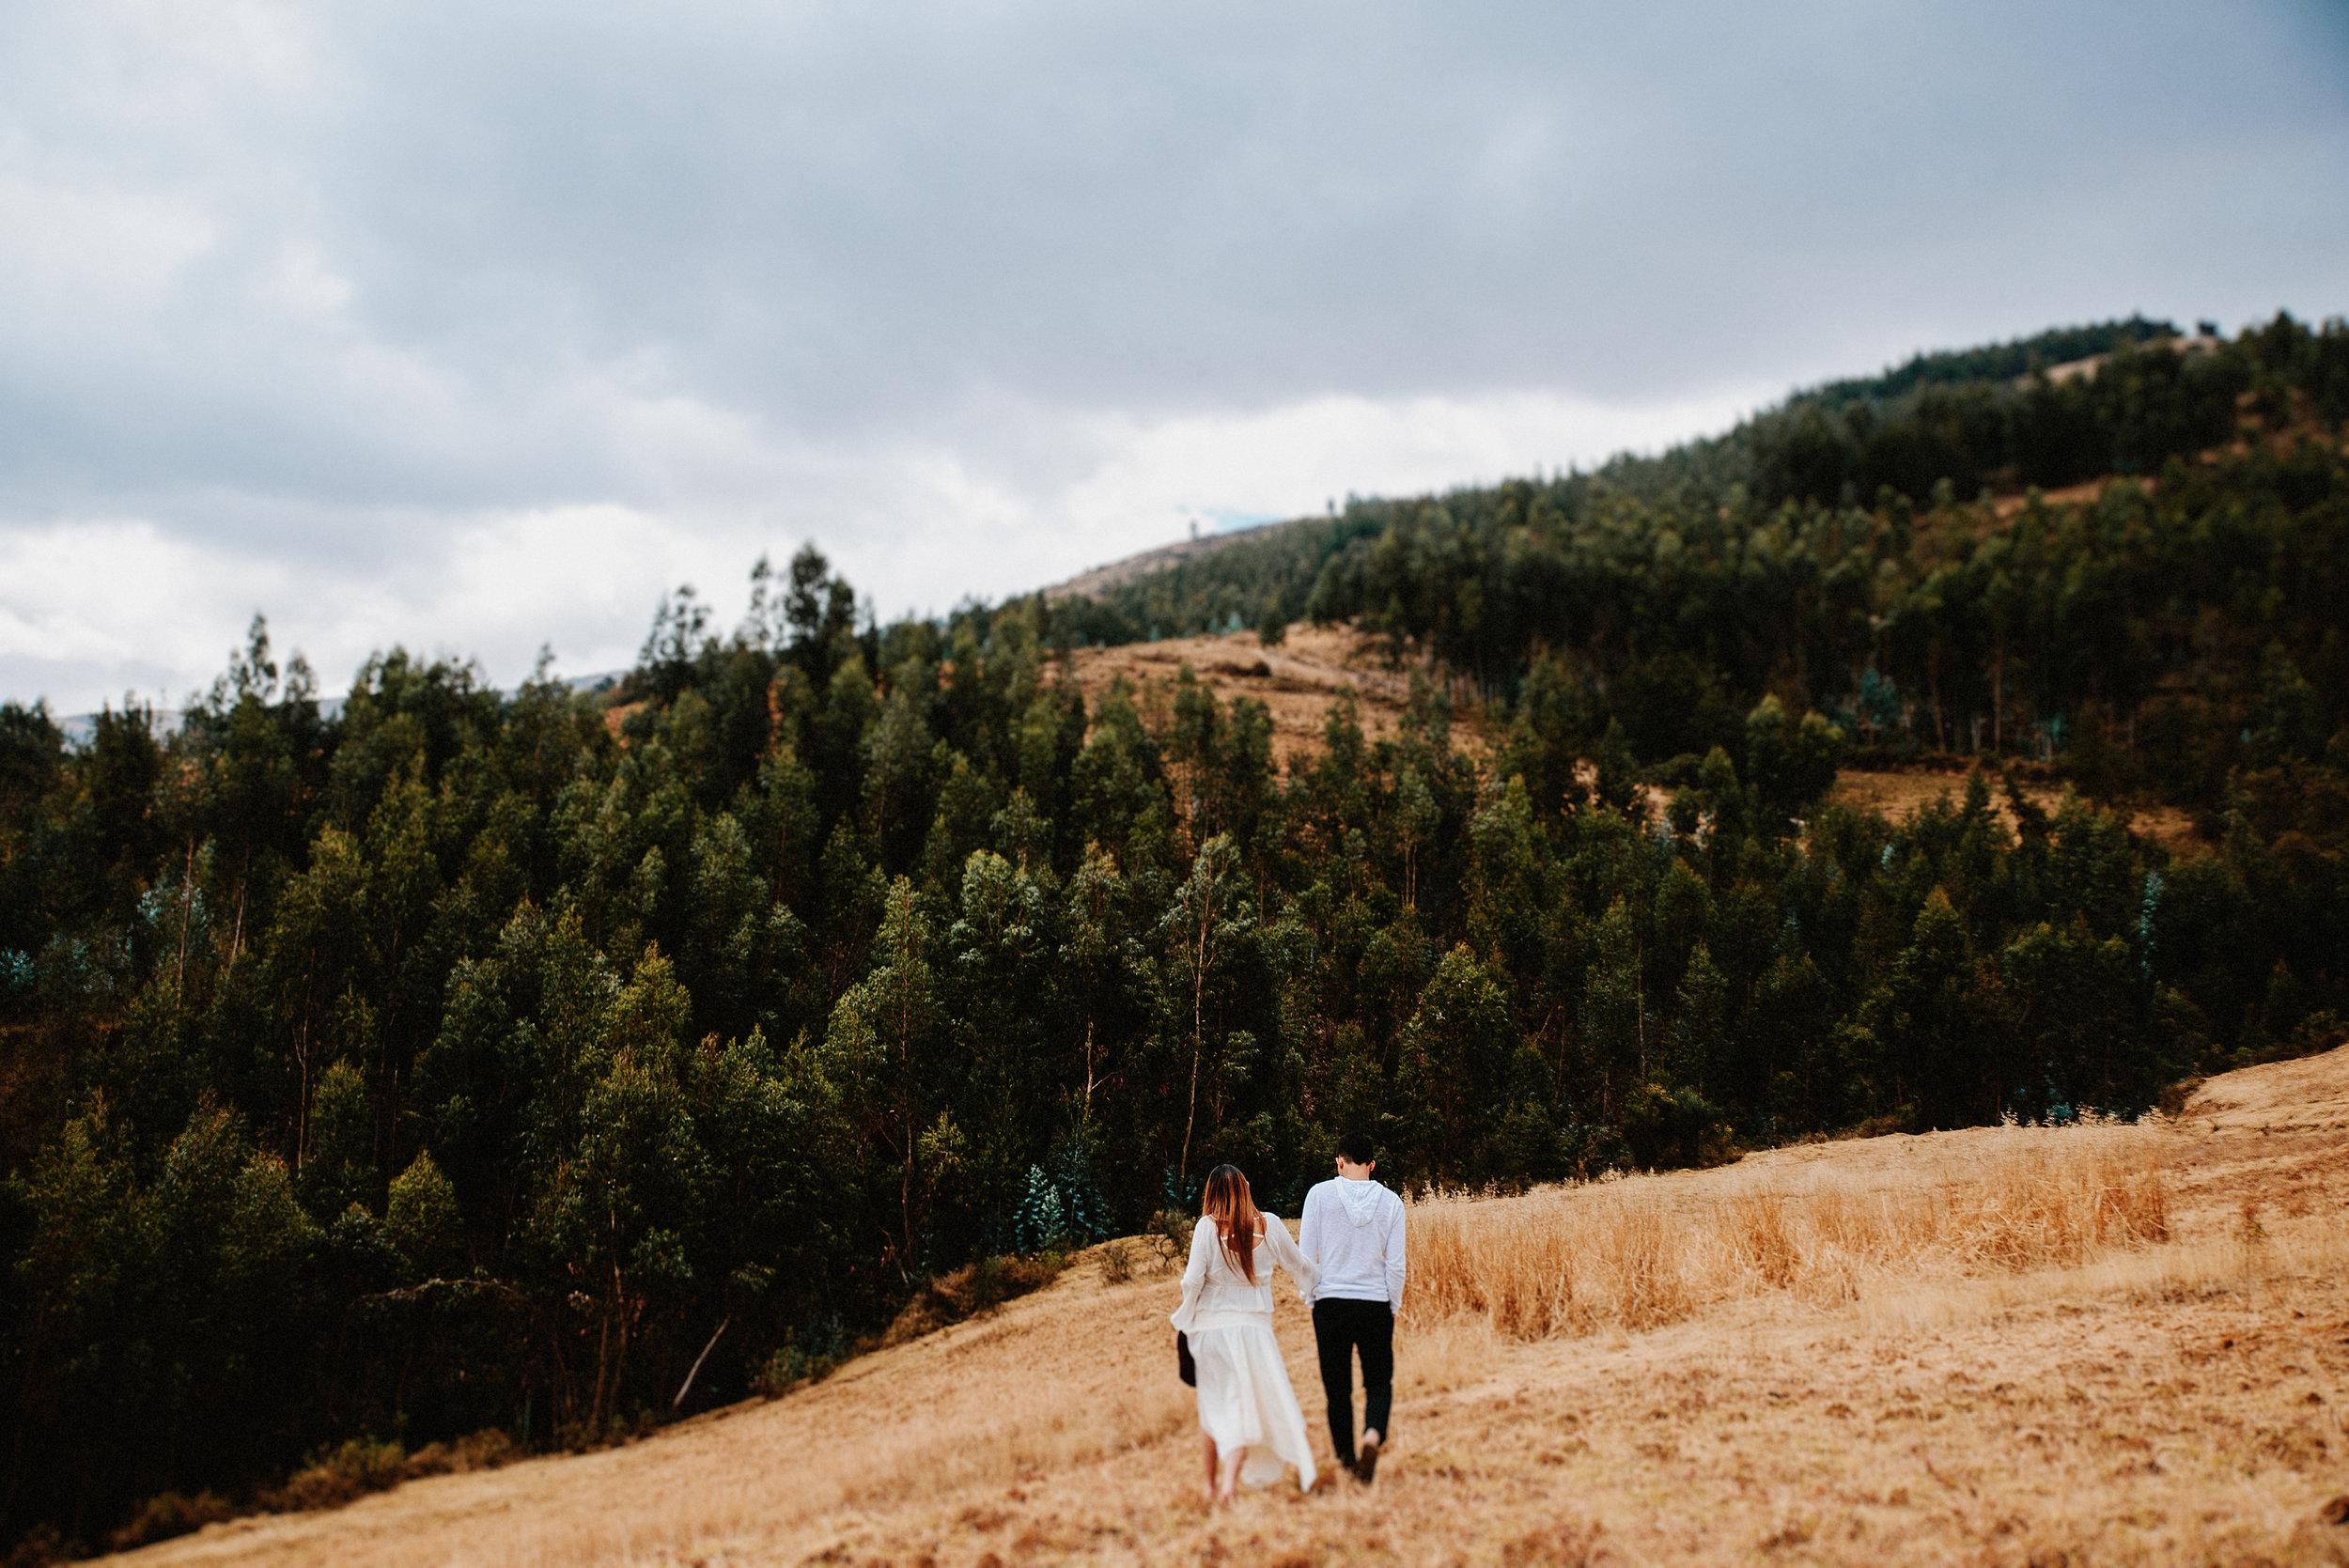 chris_infante_fotografo de bodas en perú.jpg